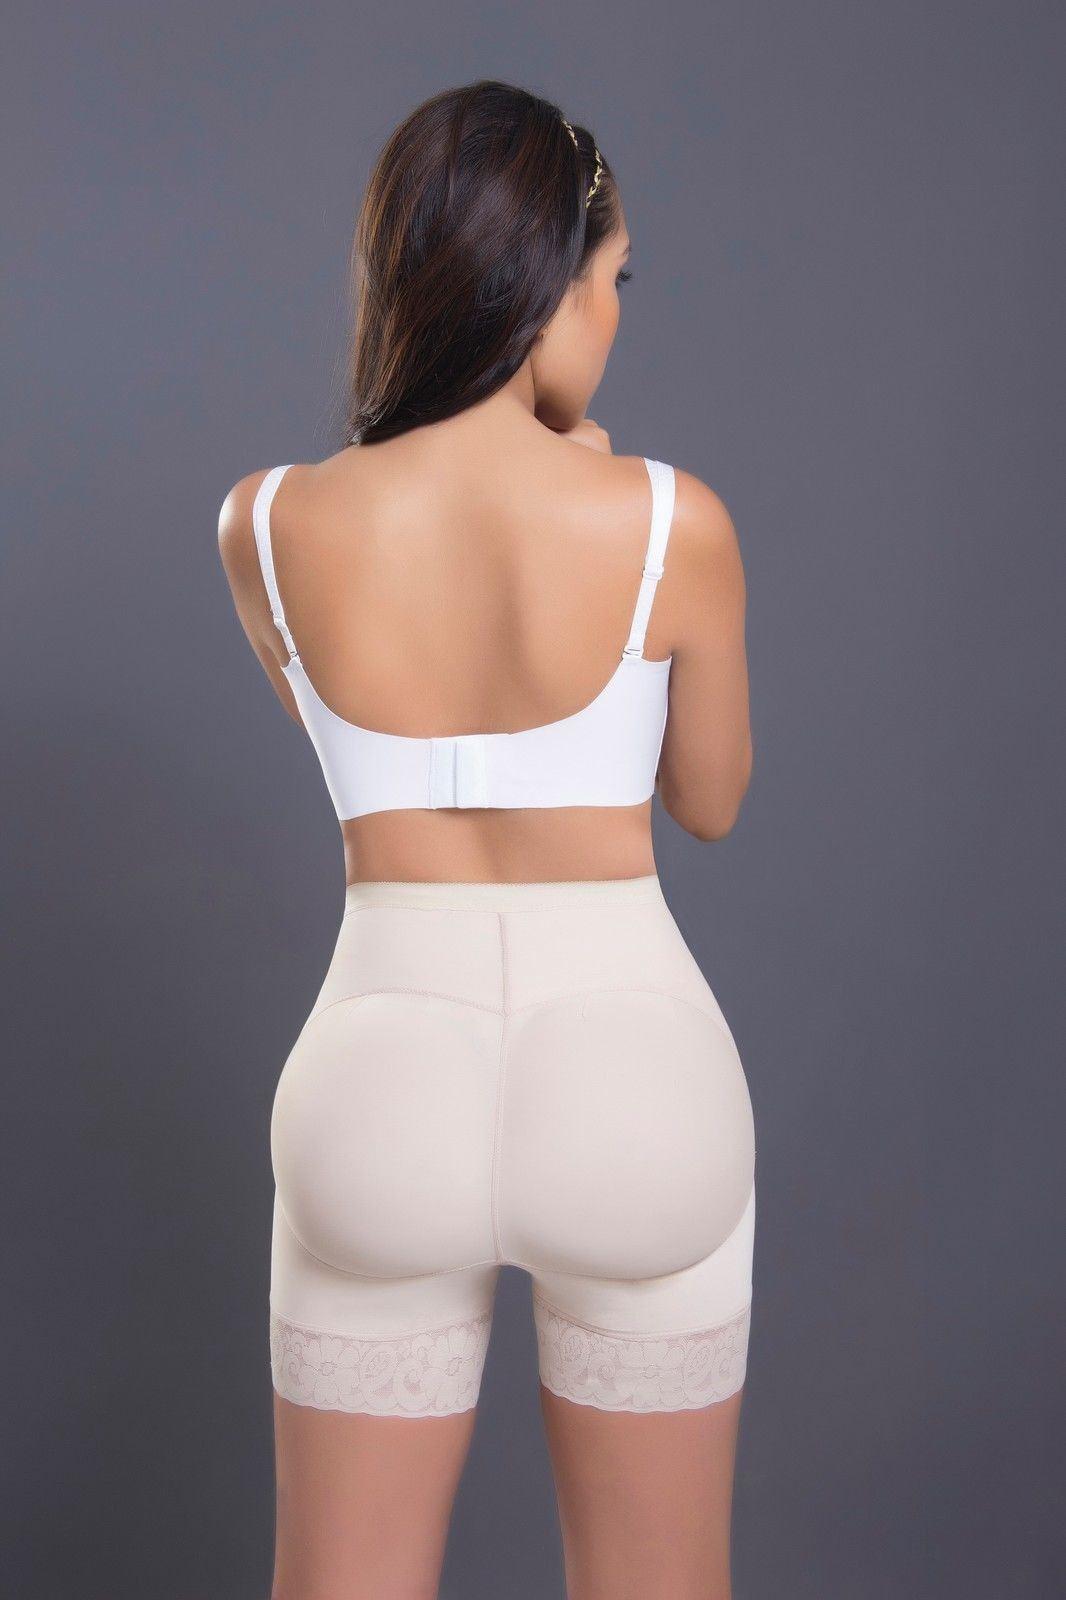 Fajas Colombianas Ann Slim High Waist Butt Lifter Panty Powernet 1012